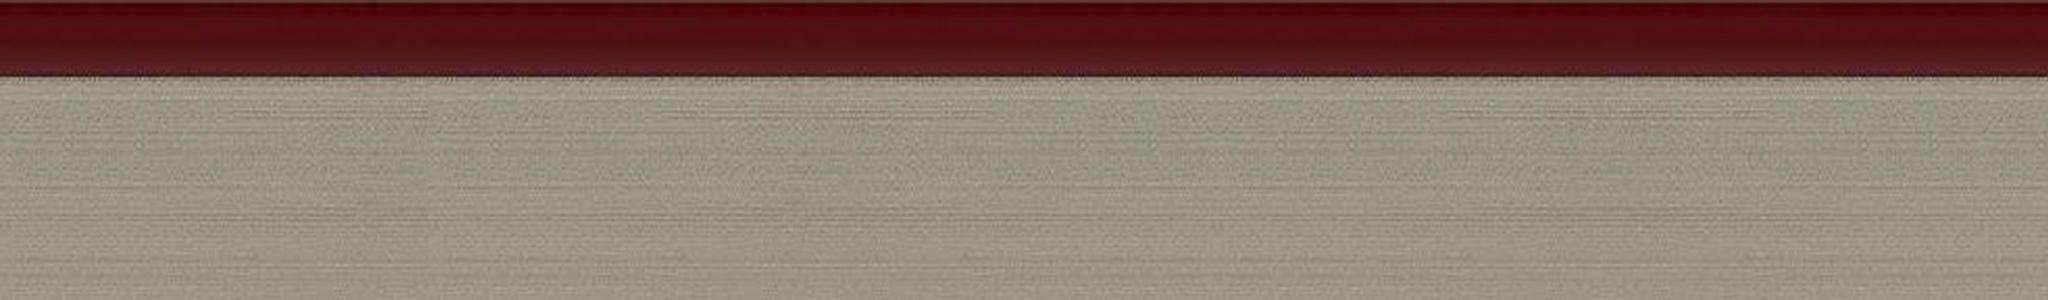 HD 29251 Acryl 3D Kante Edelstahl-Rot